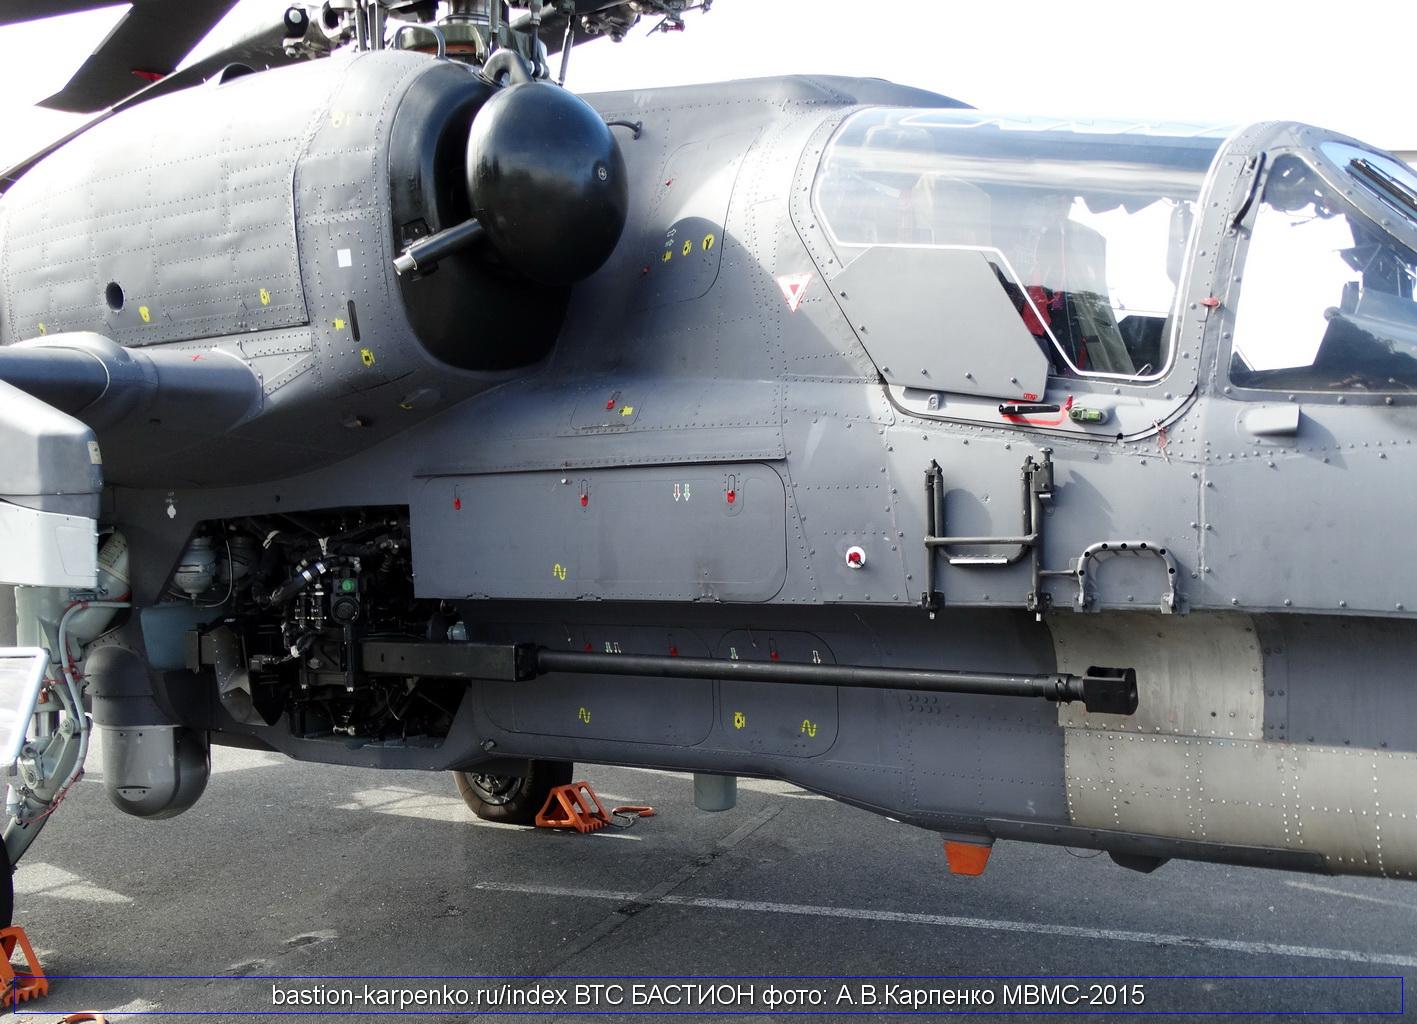 Ka-52K for Russian Navy - Page 2 KA-52K_MVMS-2015_18